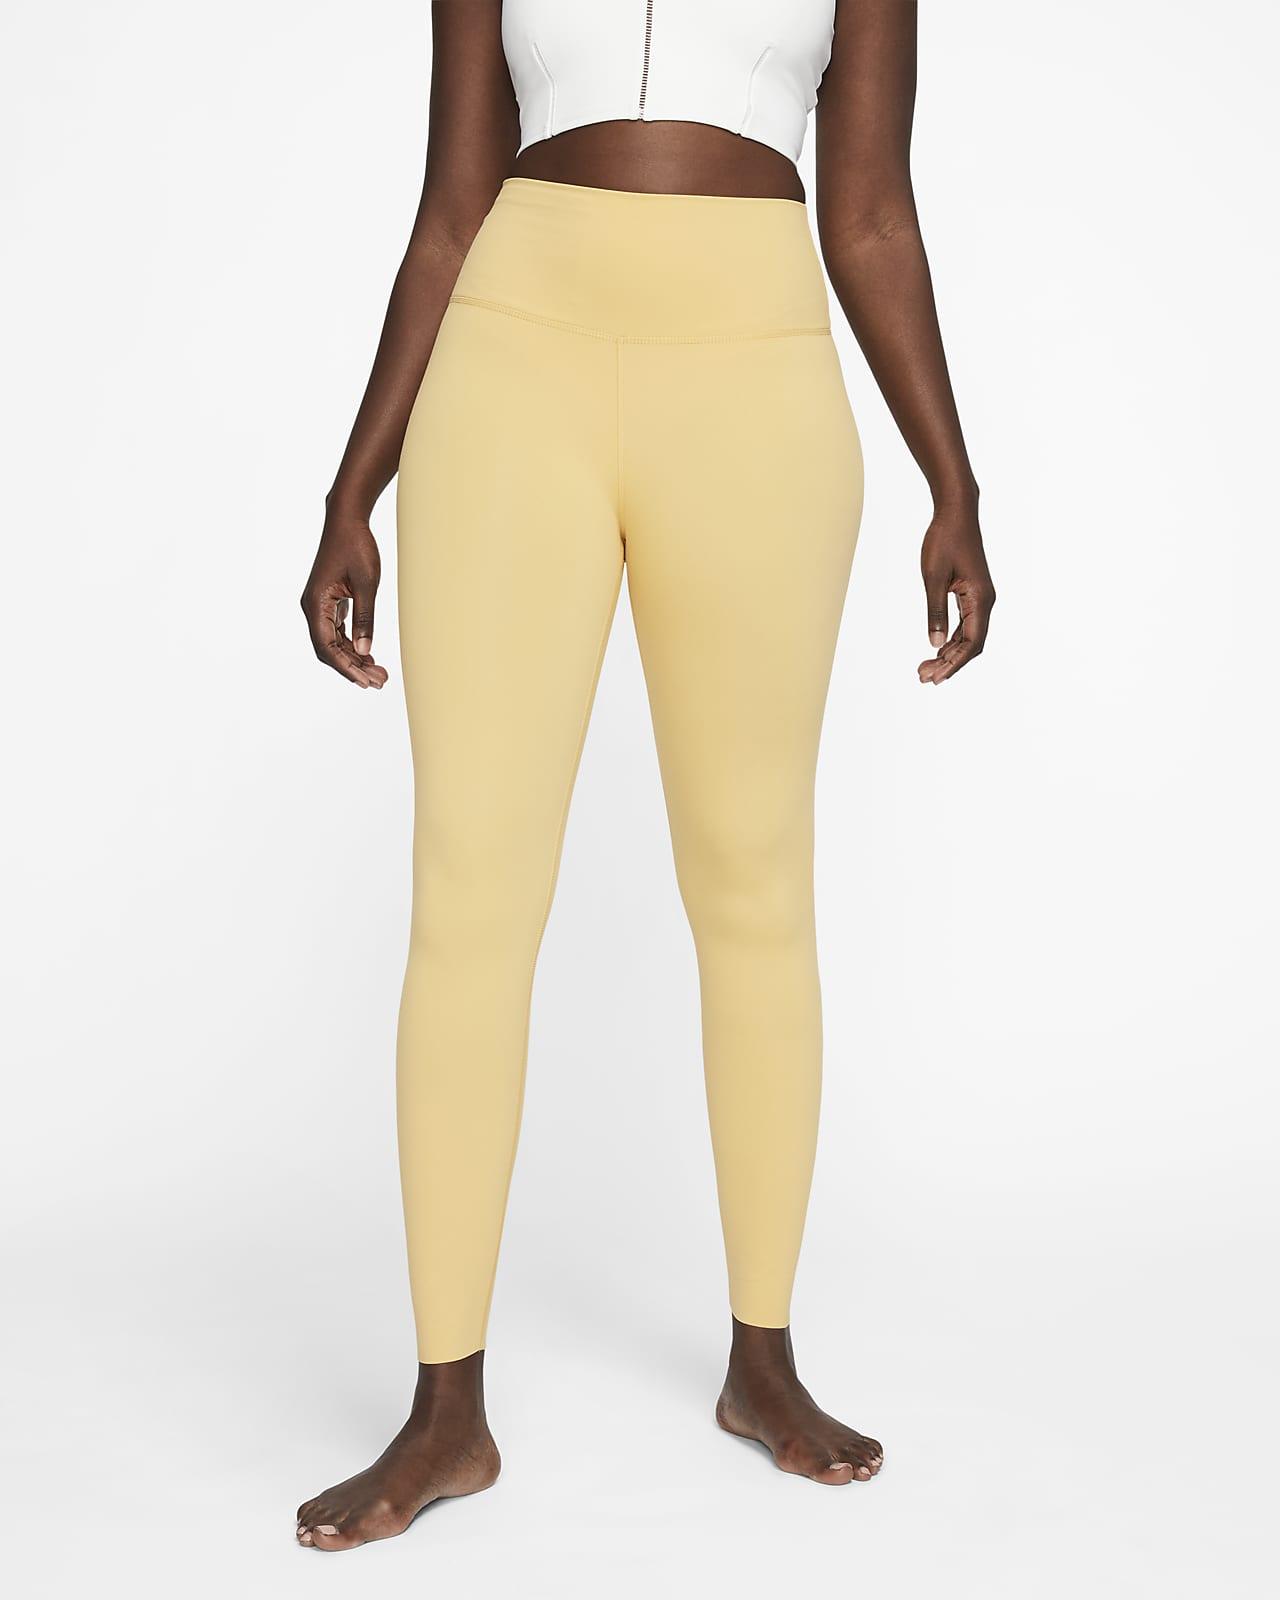 Nike Yoga Luxe Women's Infinalon 7/8 Tights